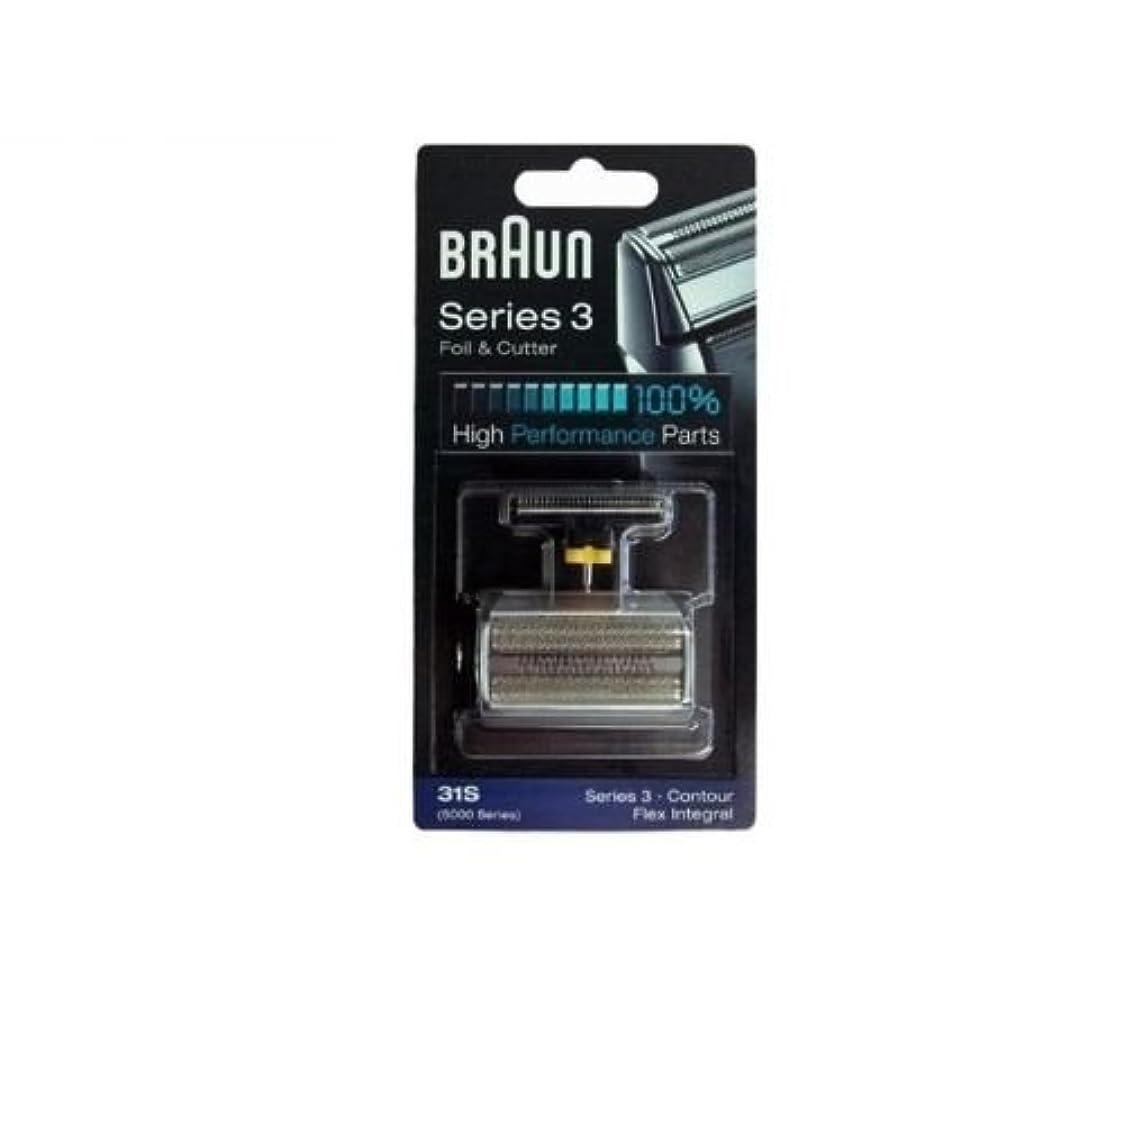 Braun 31S コンビ箔と(旧5000/6000)をカッターの交換パック [並行輸入品]